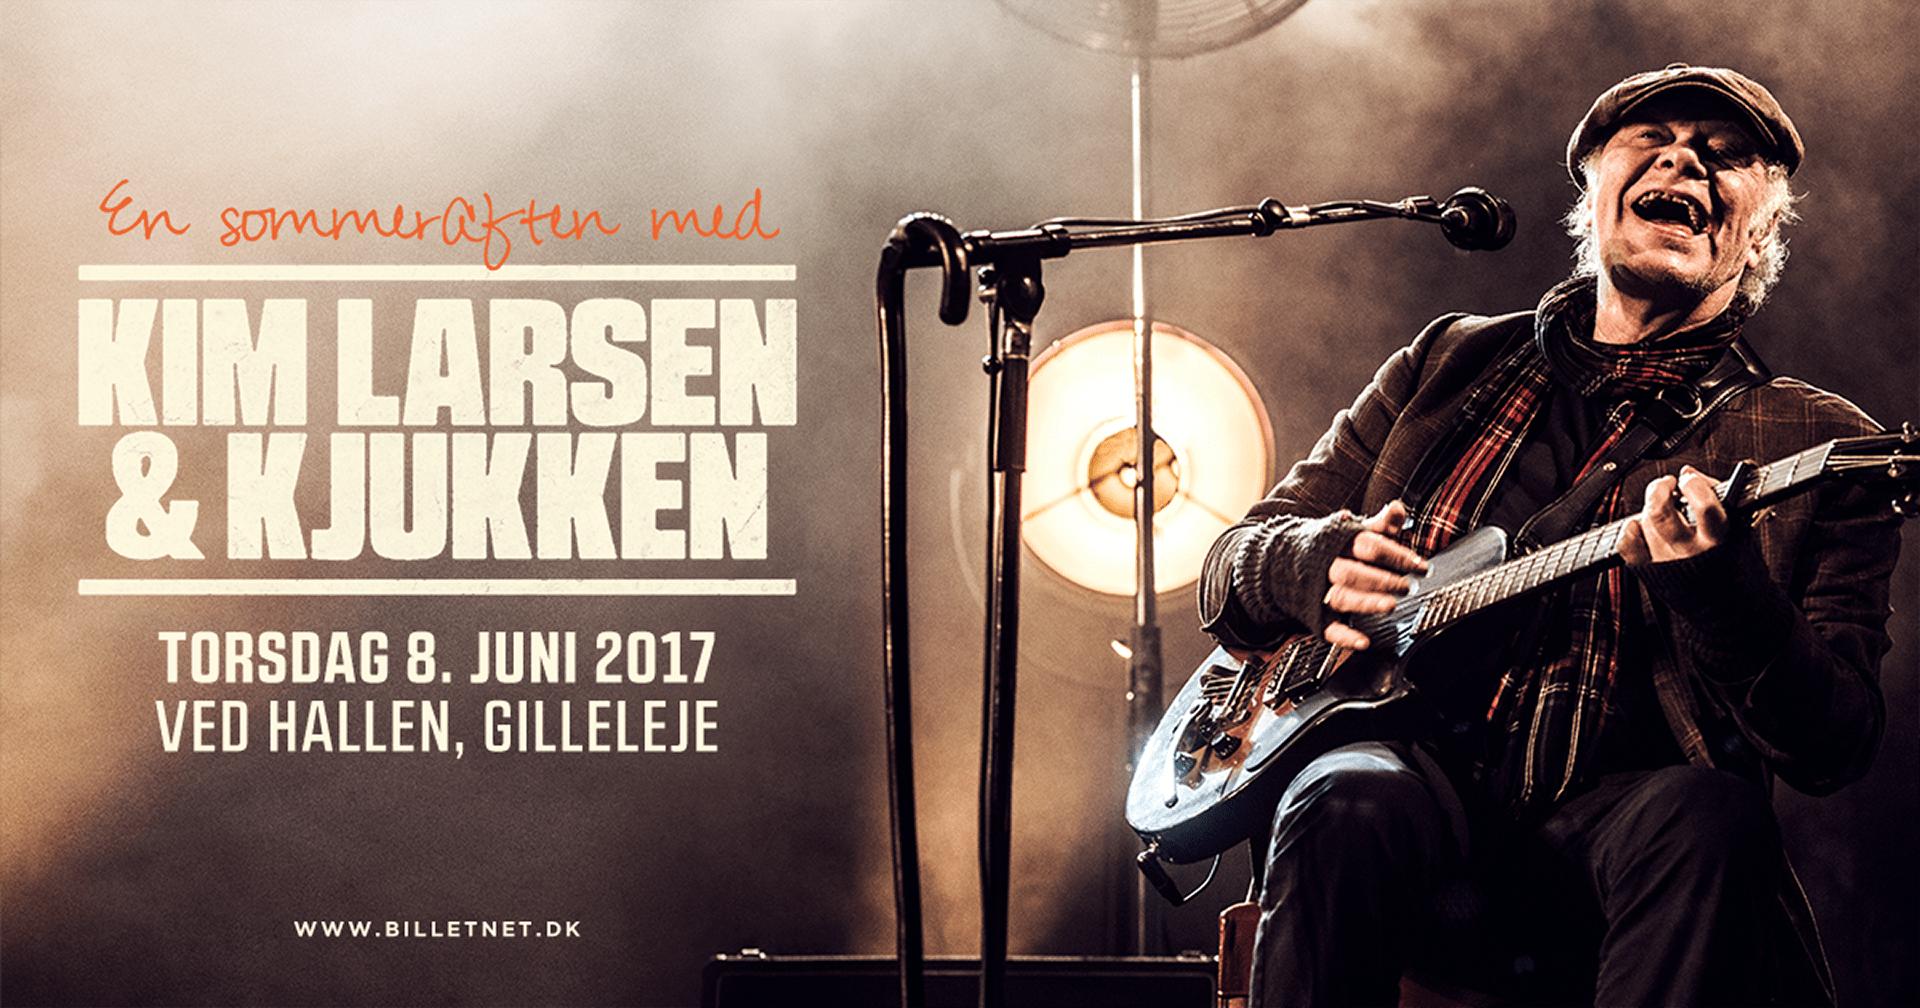 Kim Larsen & Kjukken Gilleleje